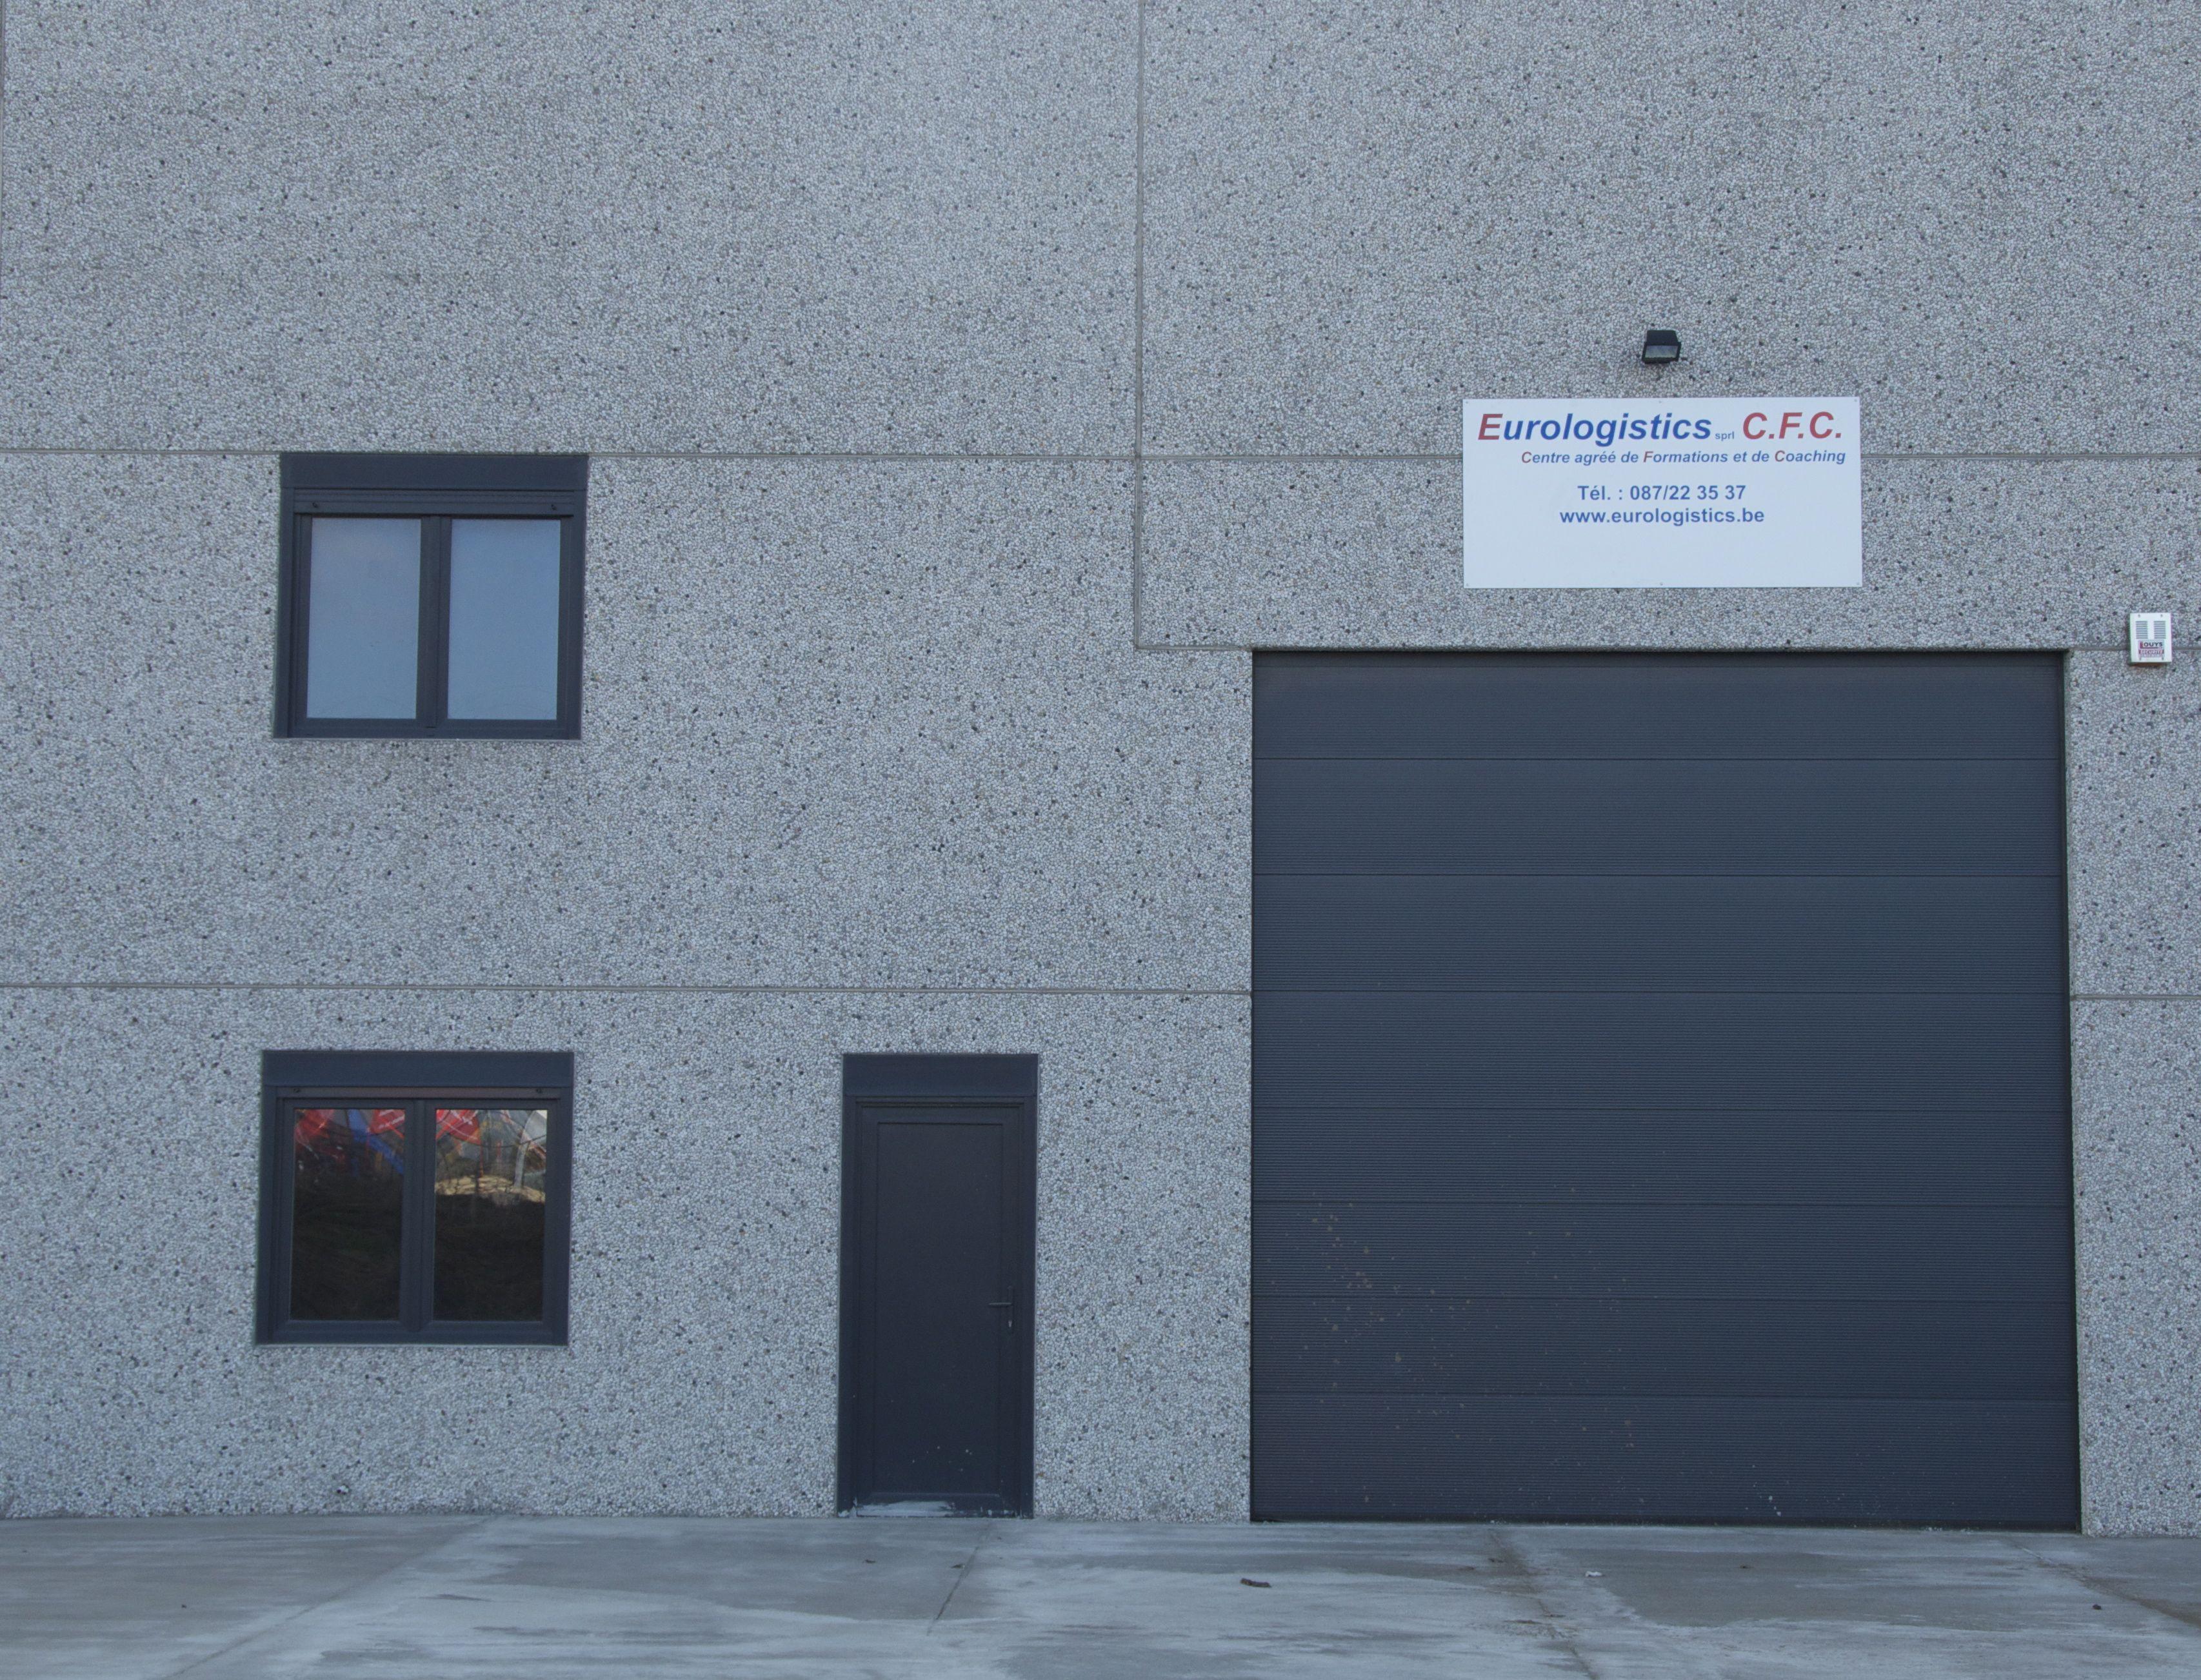 eurologistics centre de formation bureau conseil bureau d expertise coordination chantier. Black Bedroom Furniture Sets. Home Design Ideas